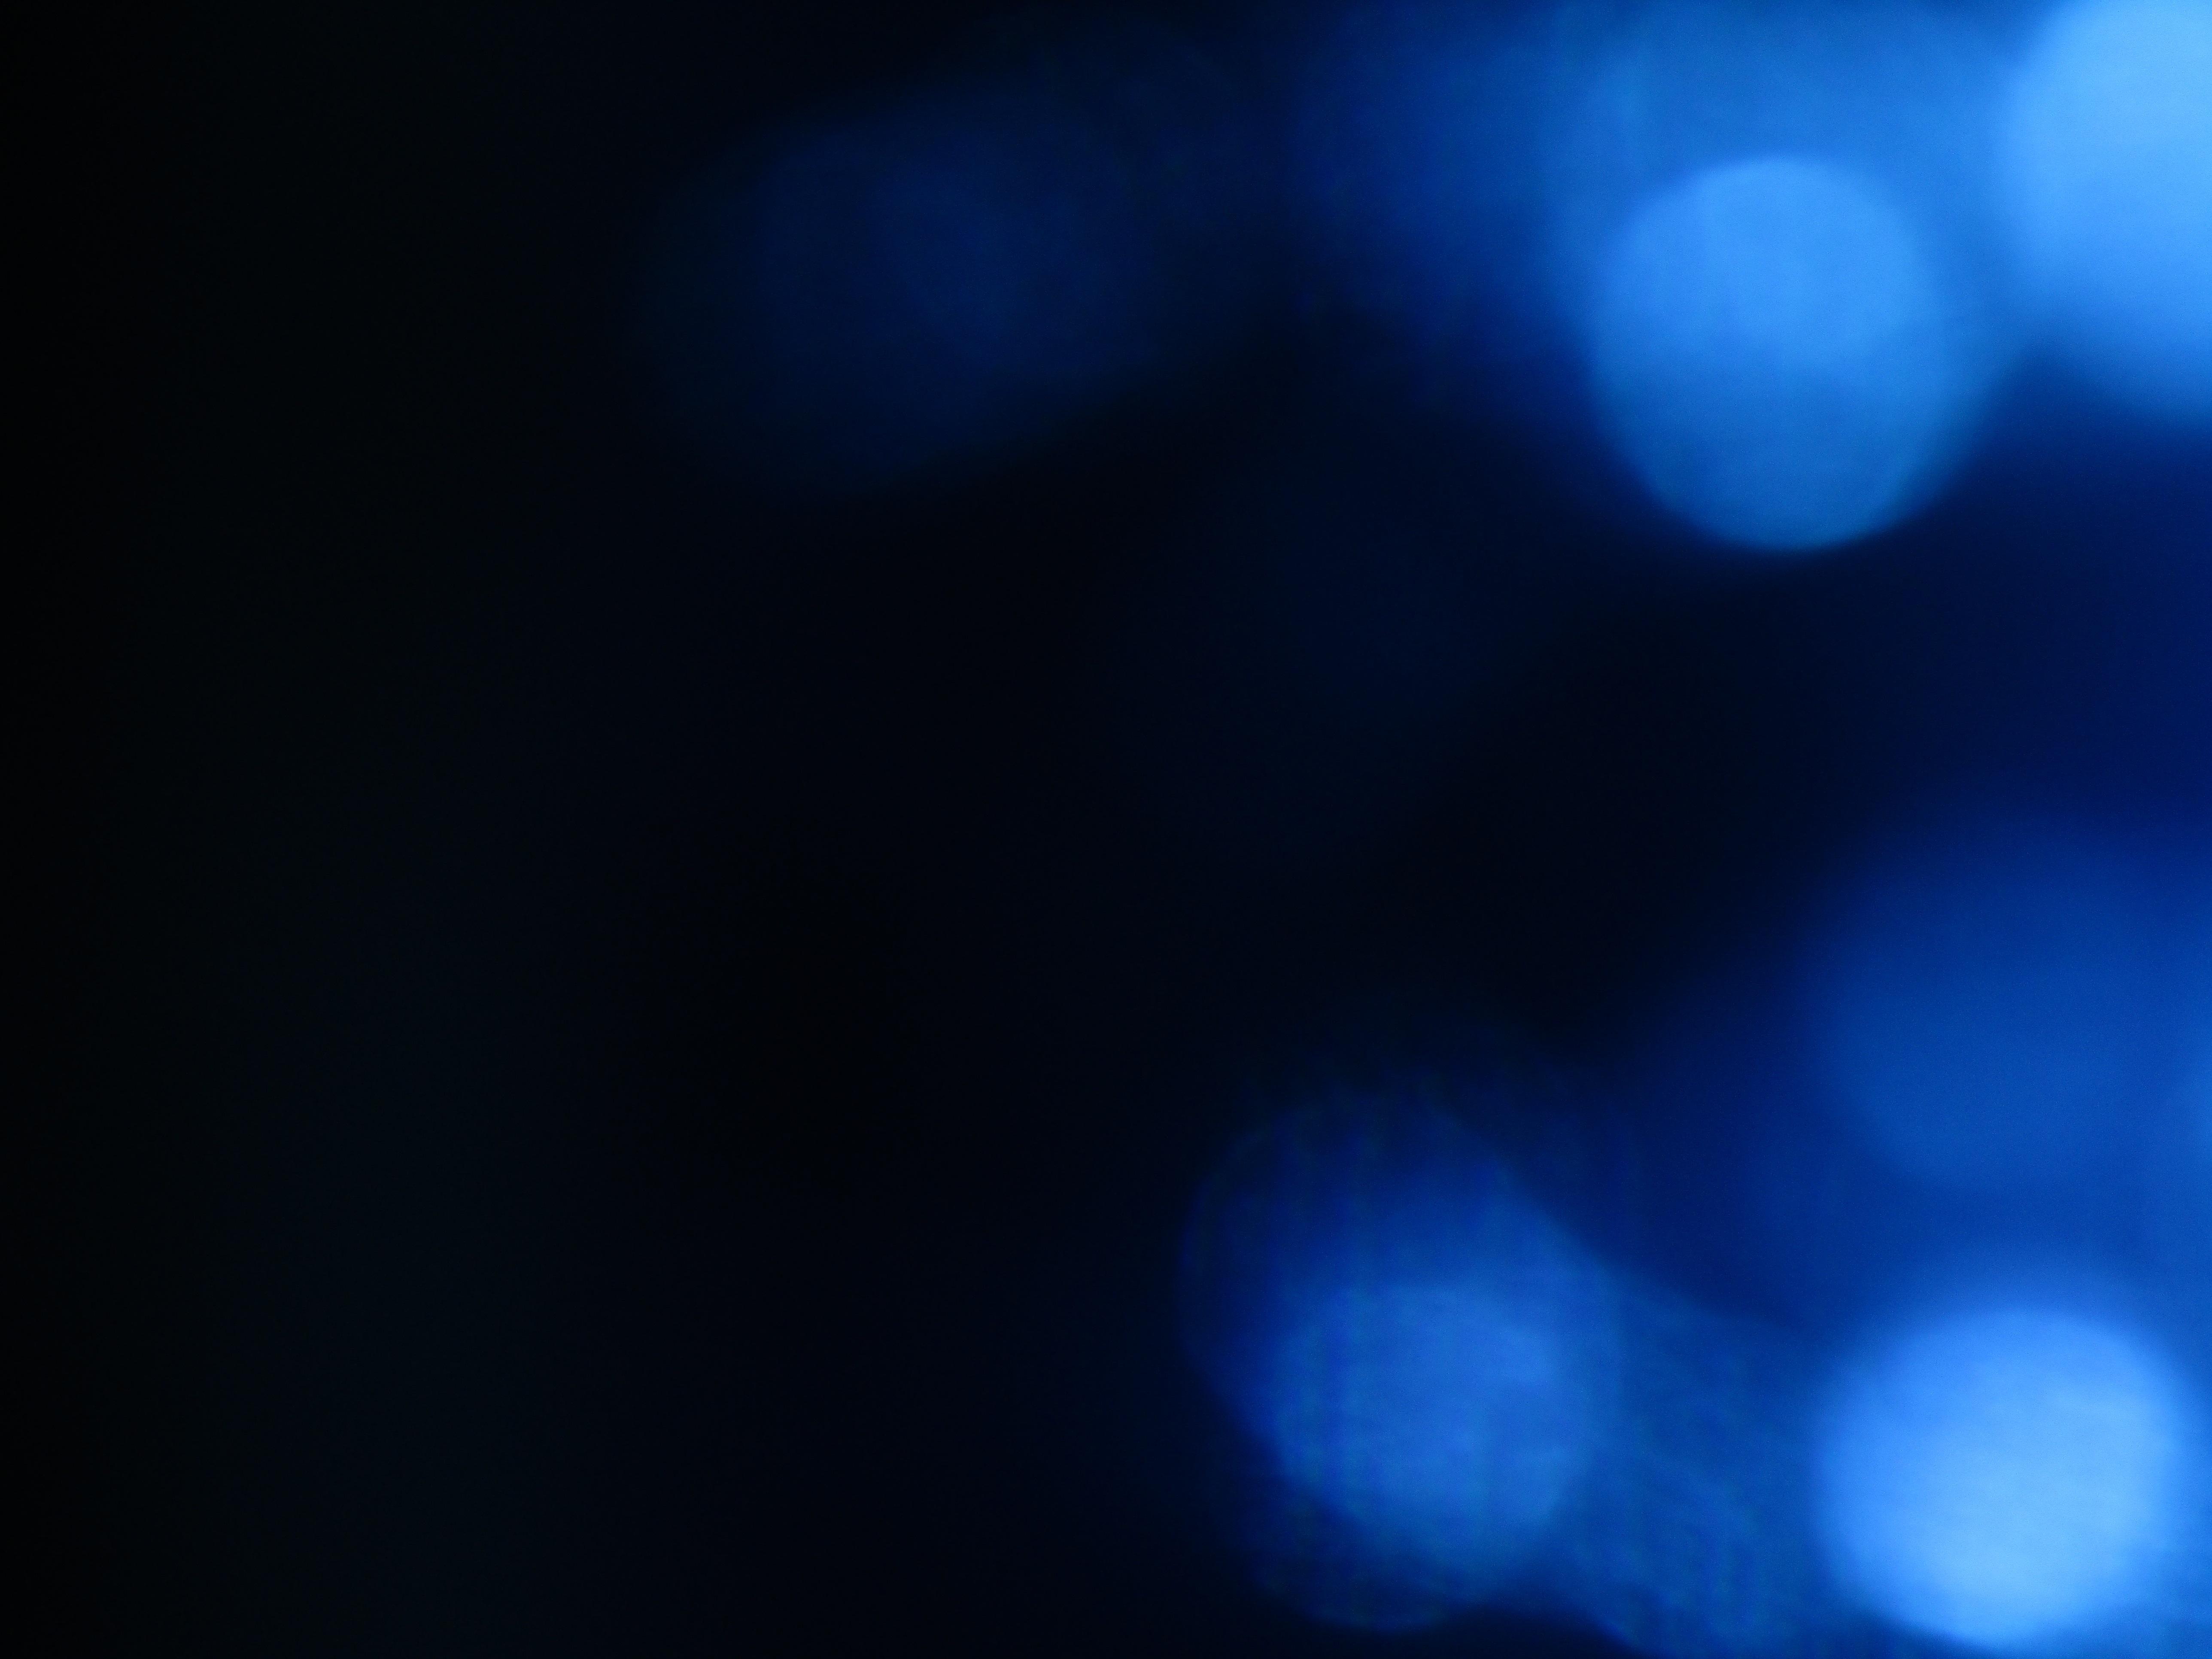 images gratuites lumi re bokeh brouiller obscurit bleu reflet contexte fond d 39 cran. Black Bedroom Furniture Sets. Home Design Ideas